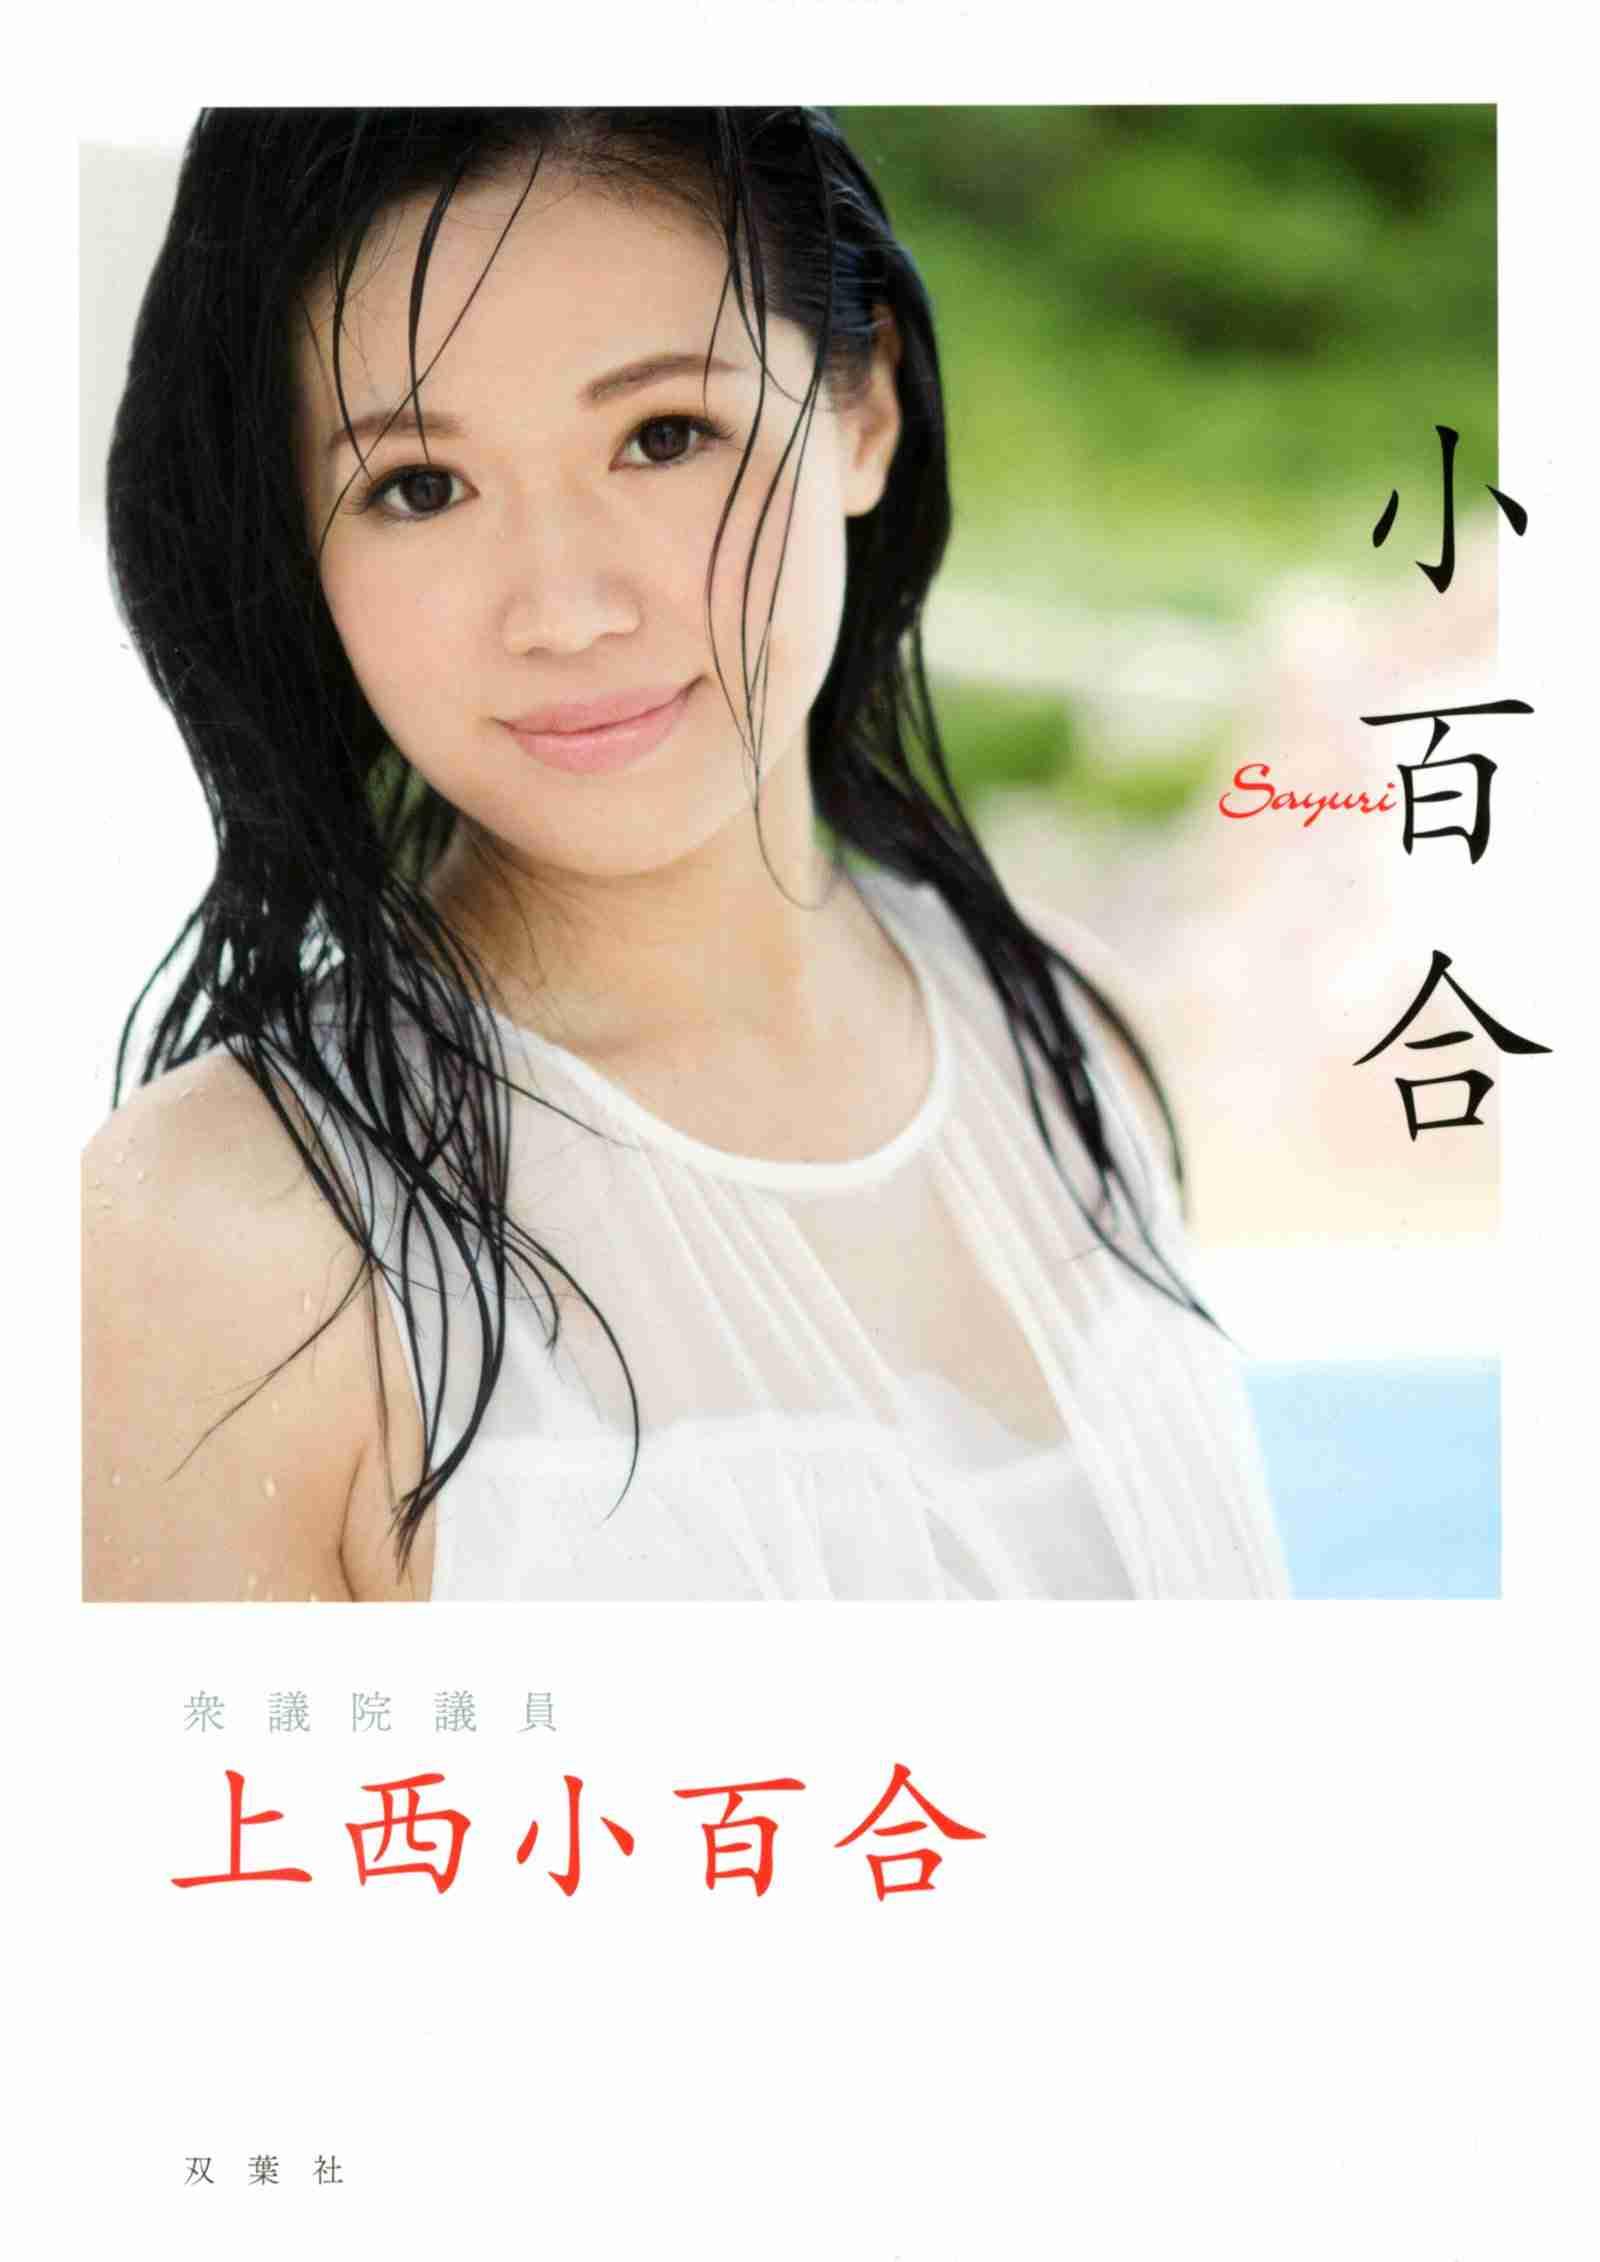 NAVER まとめ上西小百合議員がショーンK似実業家と結婚!「寿引退」望まれる!?